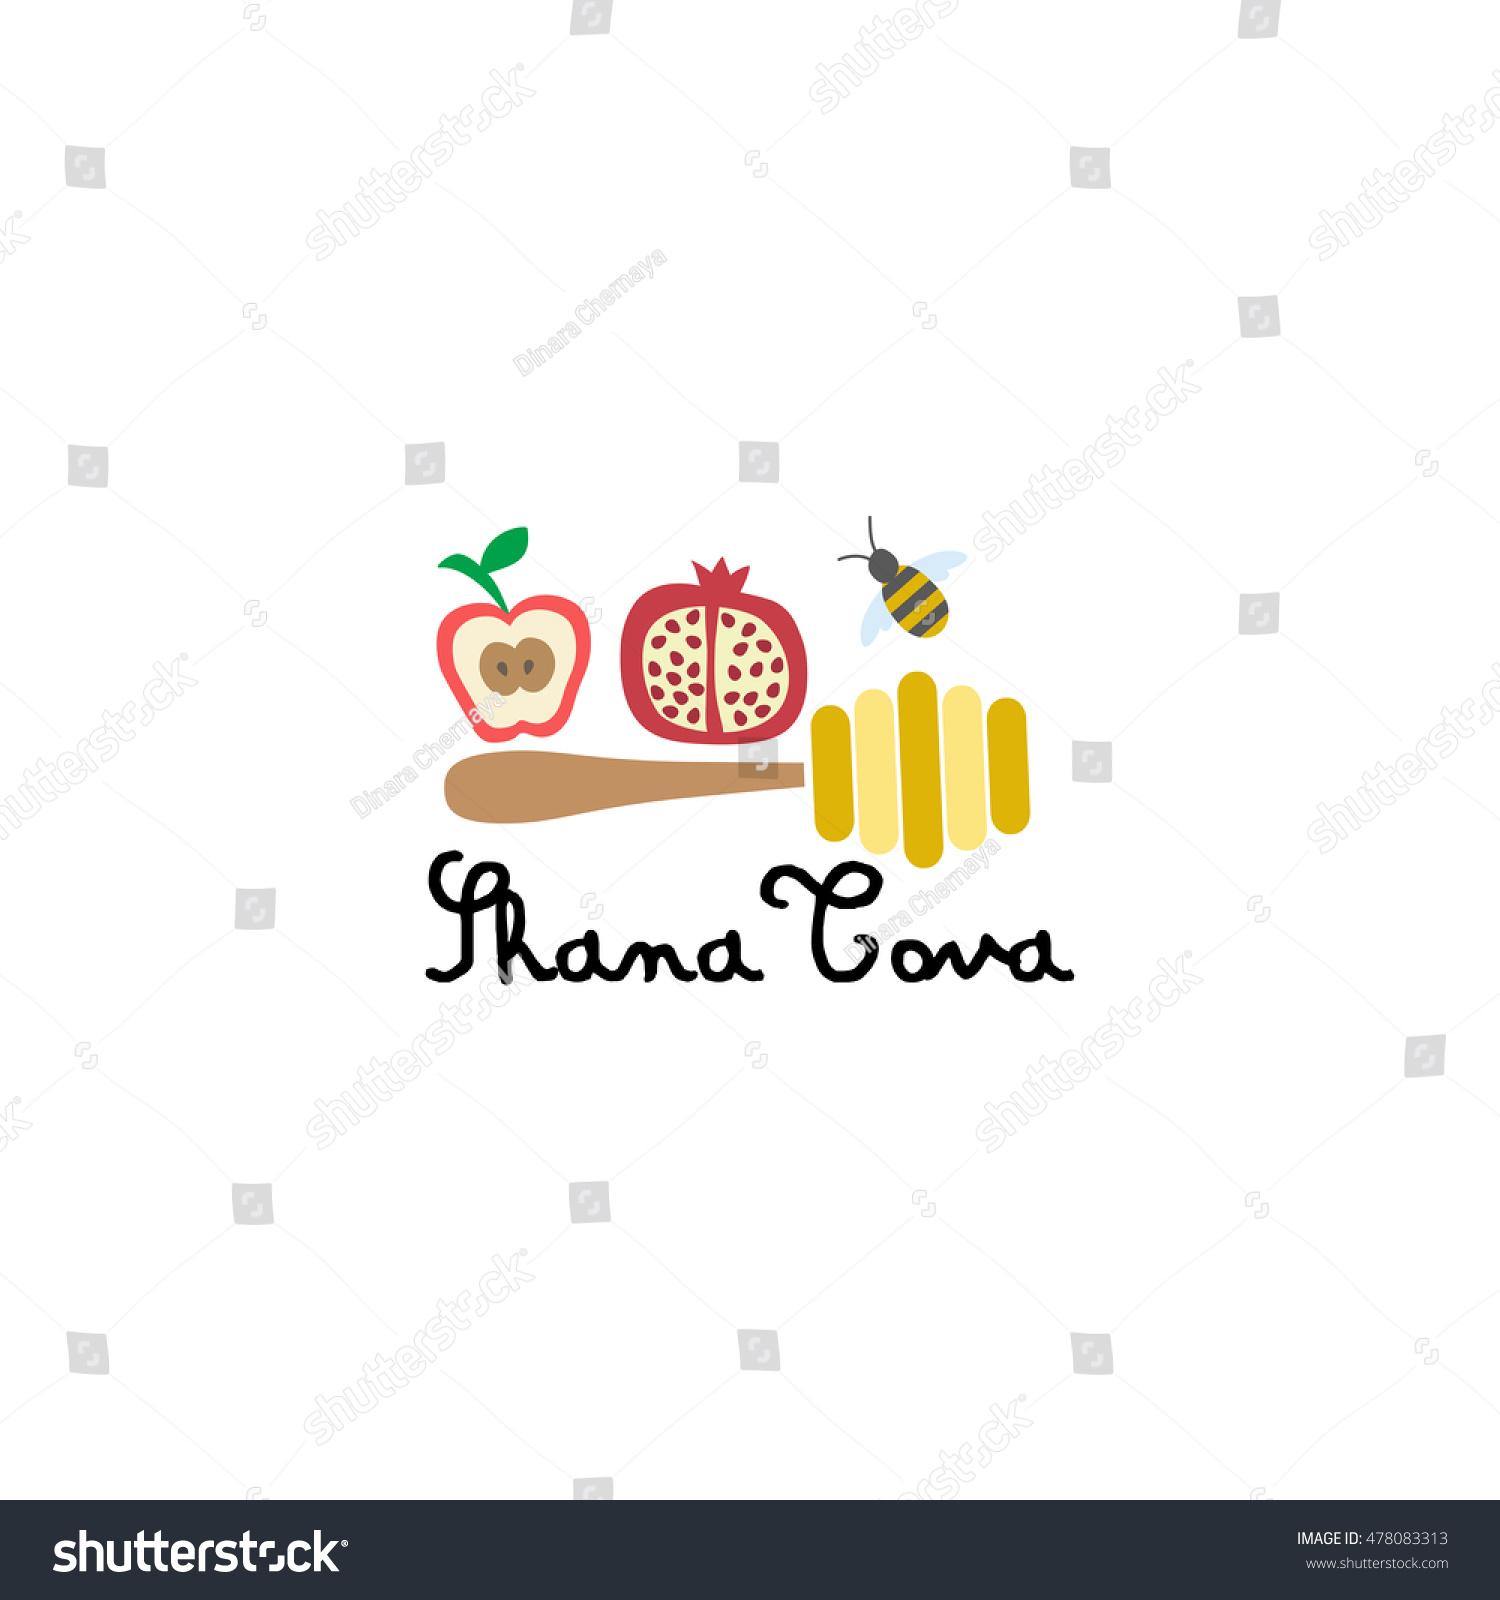 Shana tova happy new year on stock vector 478083313 shutterstock shana tova happy new year on hebrew greeting card for jewish kristyandbryce Images